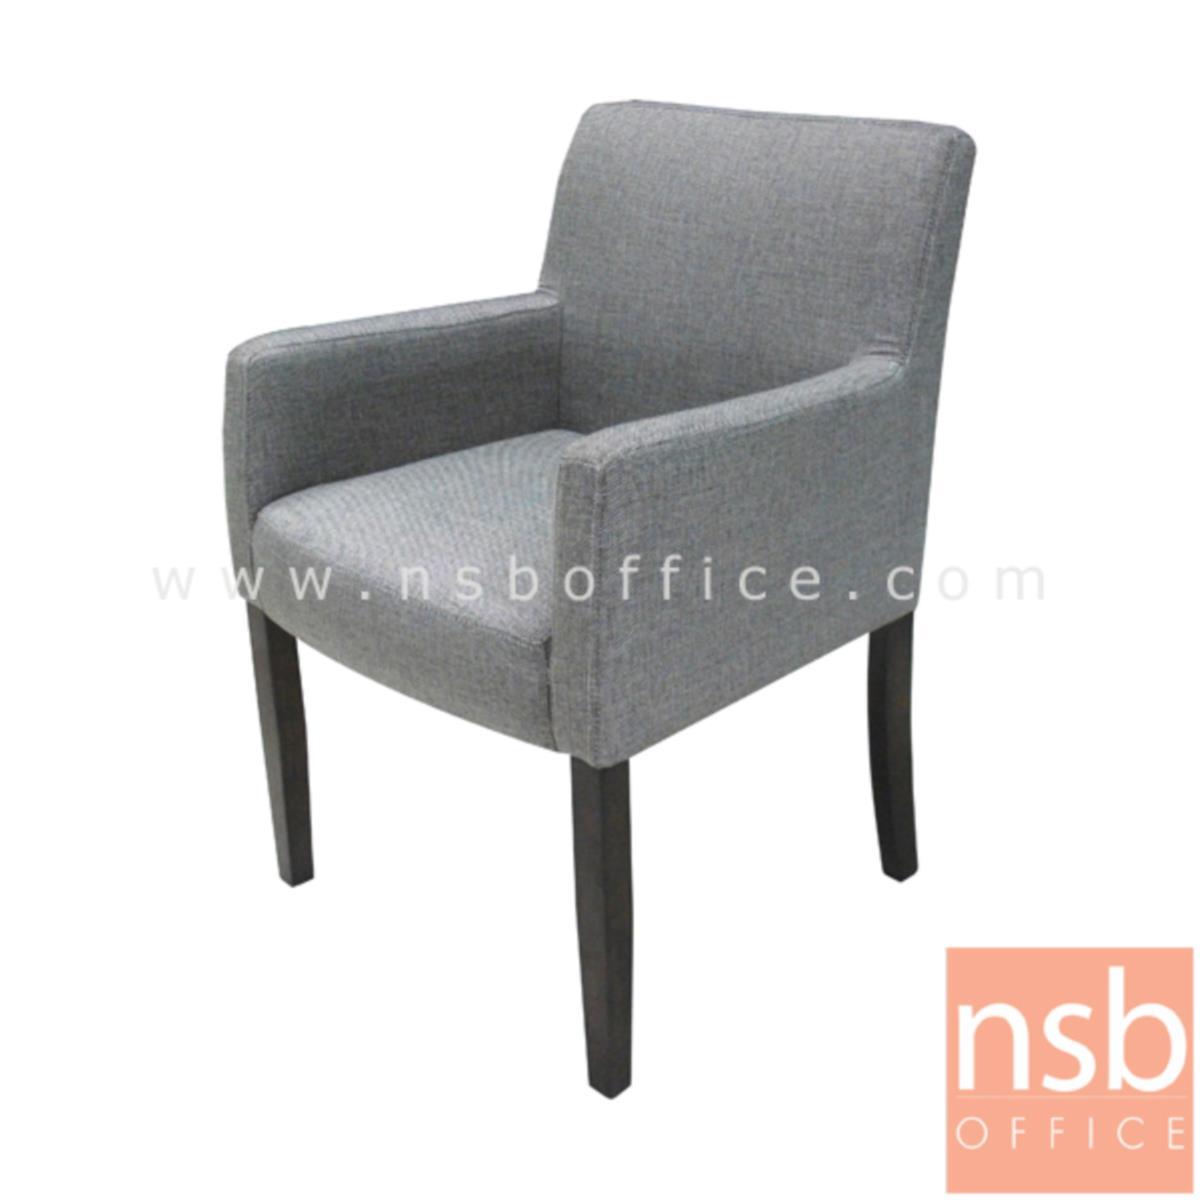 B29A249:เก้าอี้โมเดิร์นหุ้มผ้า รุ่น Eckhart (เอคฮาร์ท) ขนาด 60W cm. โครงขาไม้